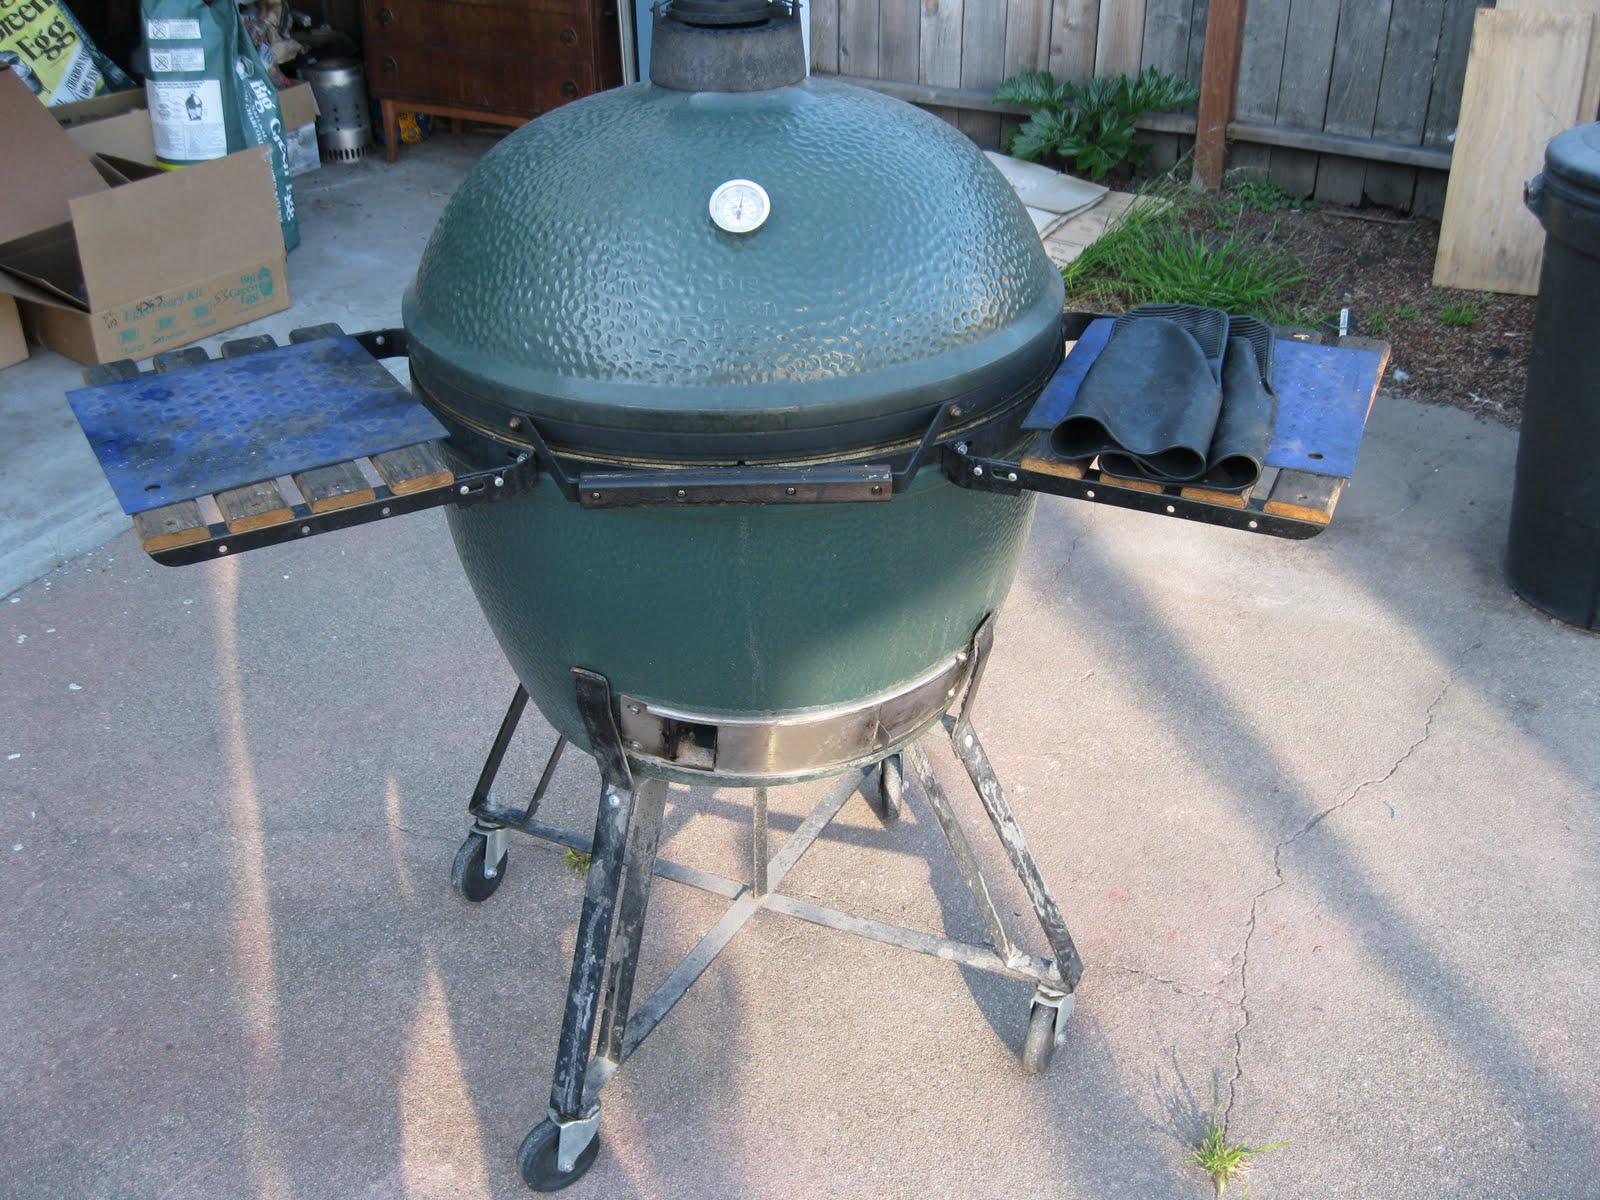 Kevin Mac Cooking: Steak on the Big Green Egg